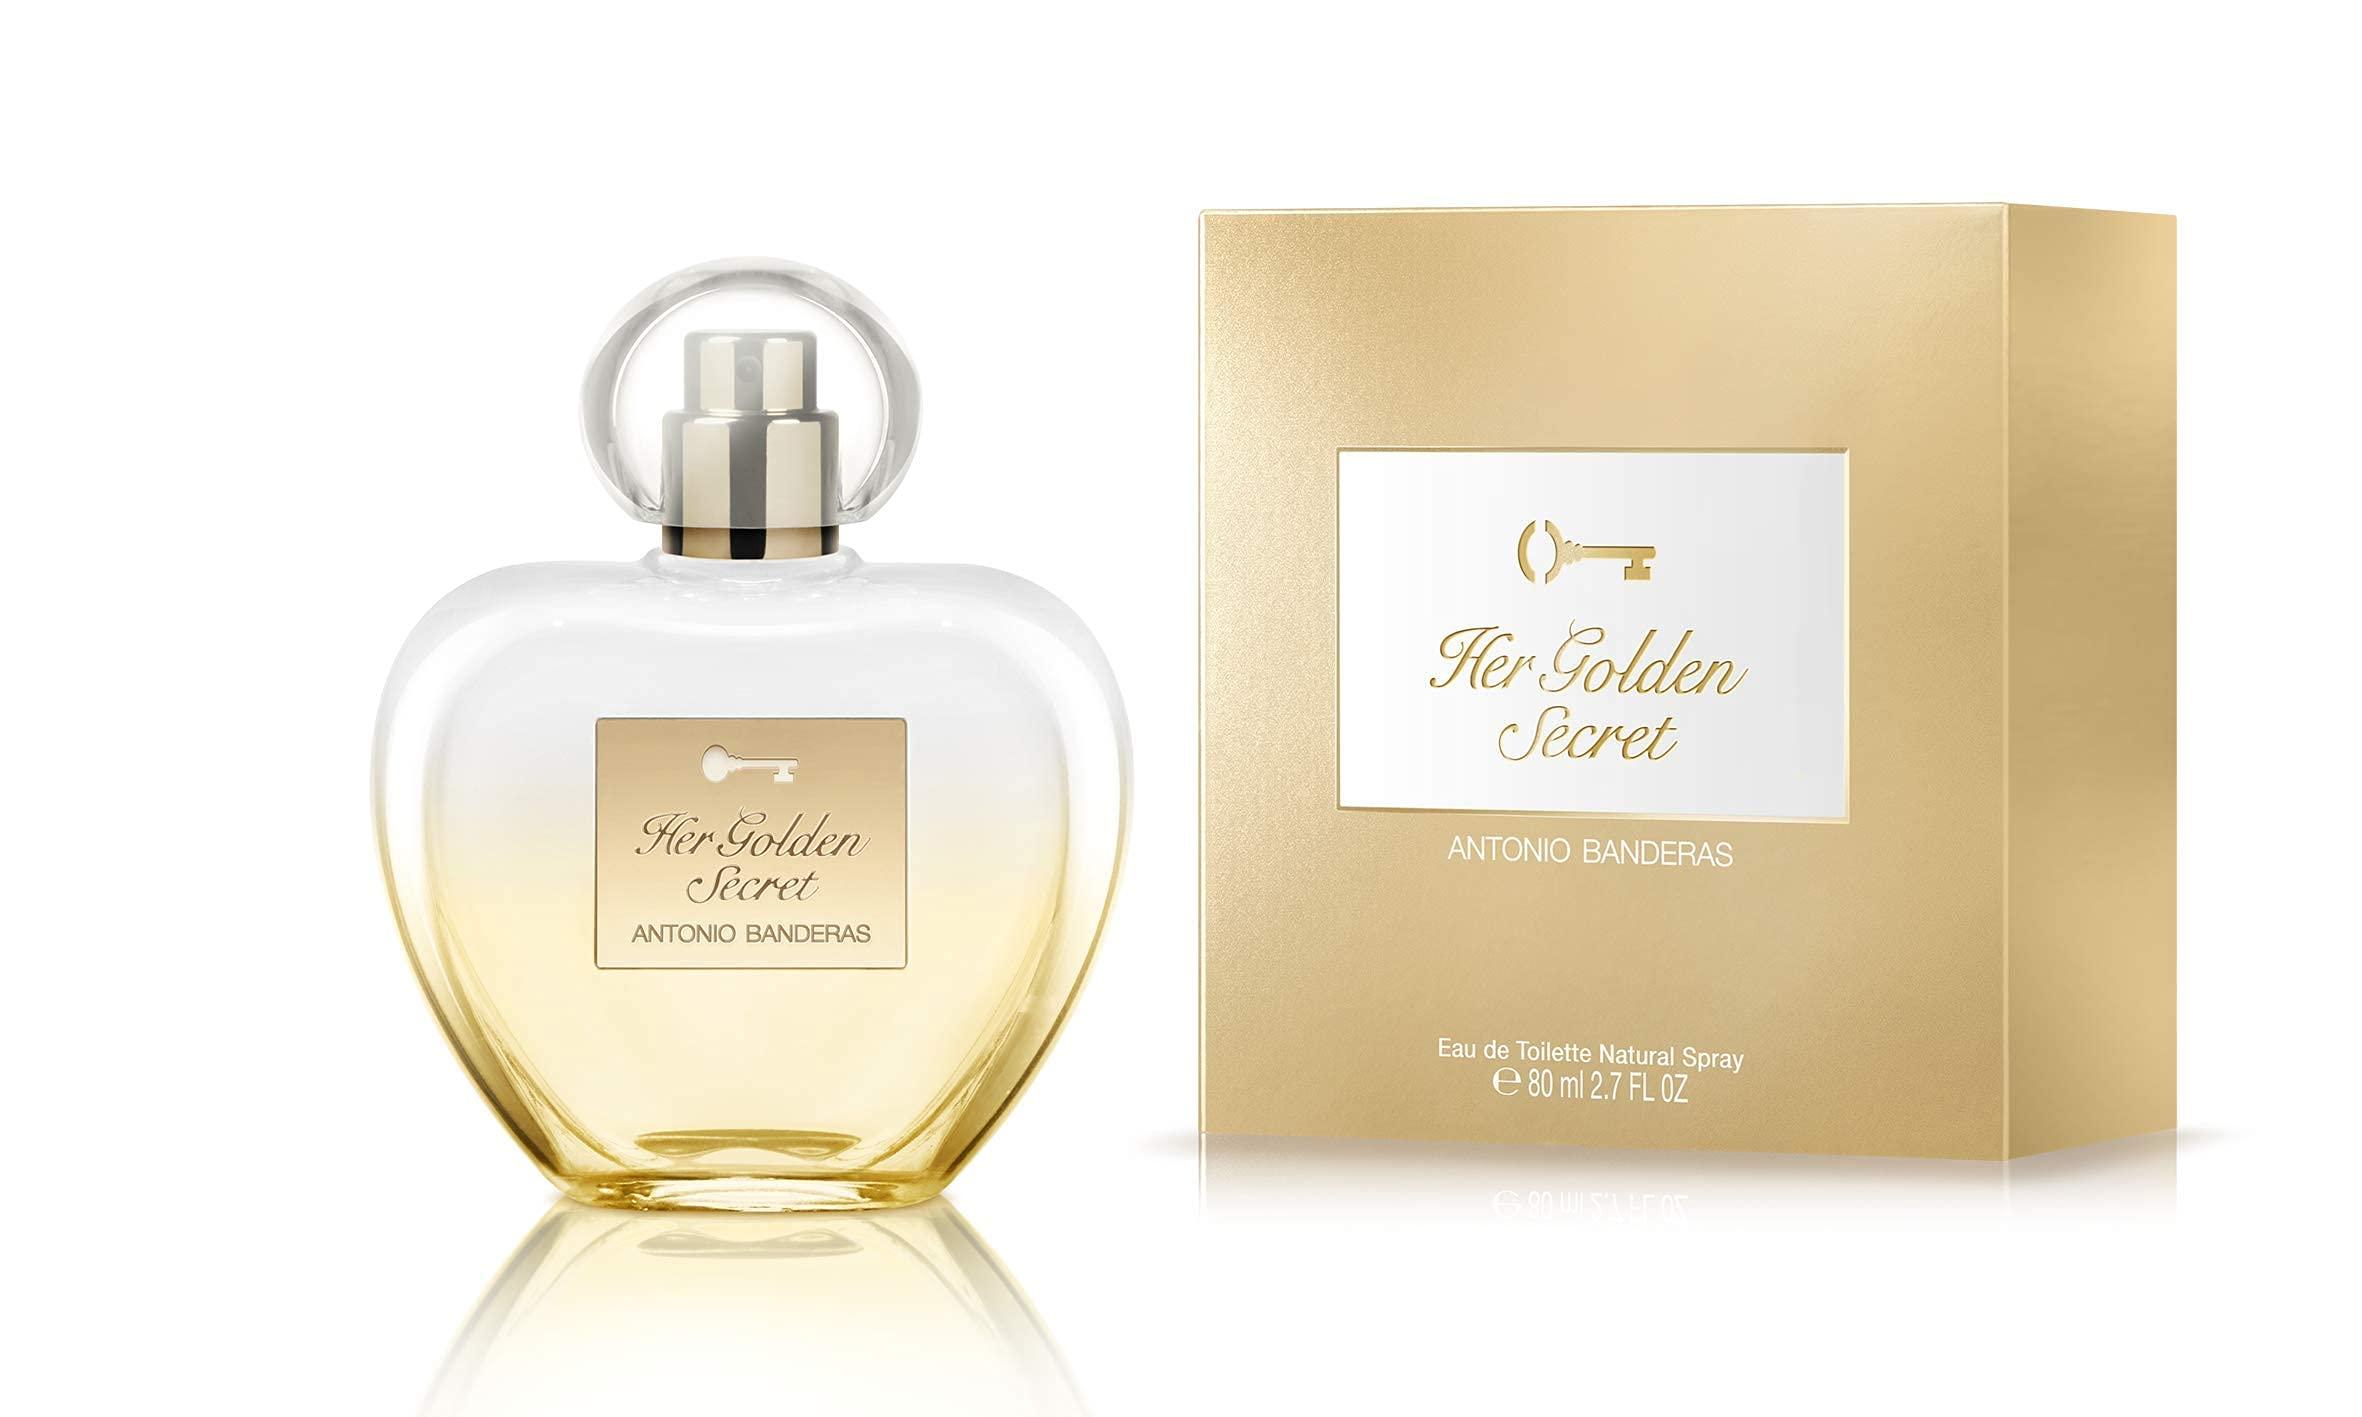 Antonio Banderas Perfumes - Her Golden Secret - Eau de Toilette Spray for Women, Floral and Oriental Fragrance - 2.7 Fl Oz